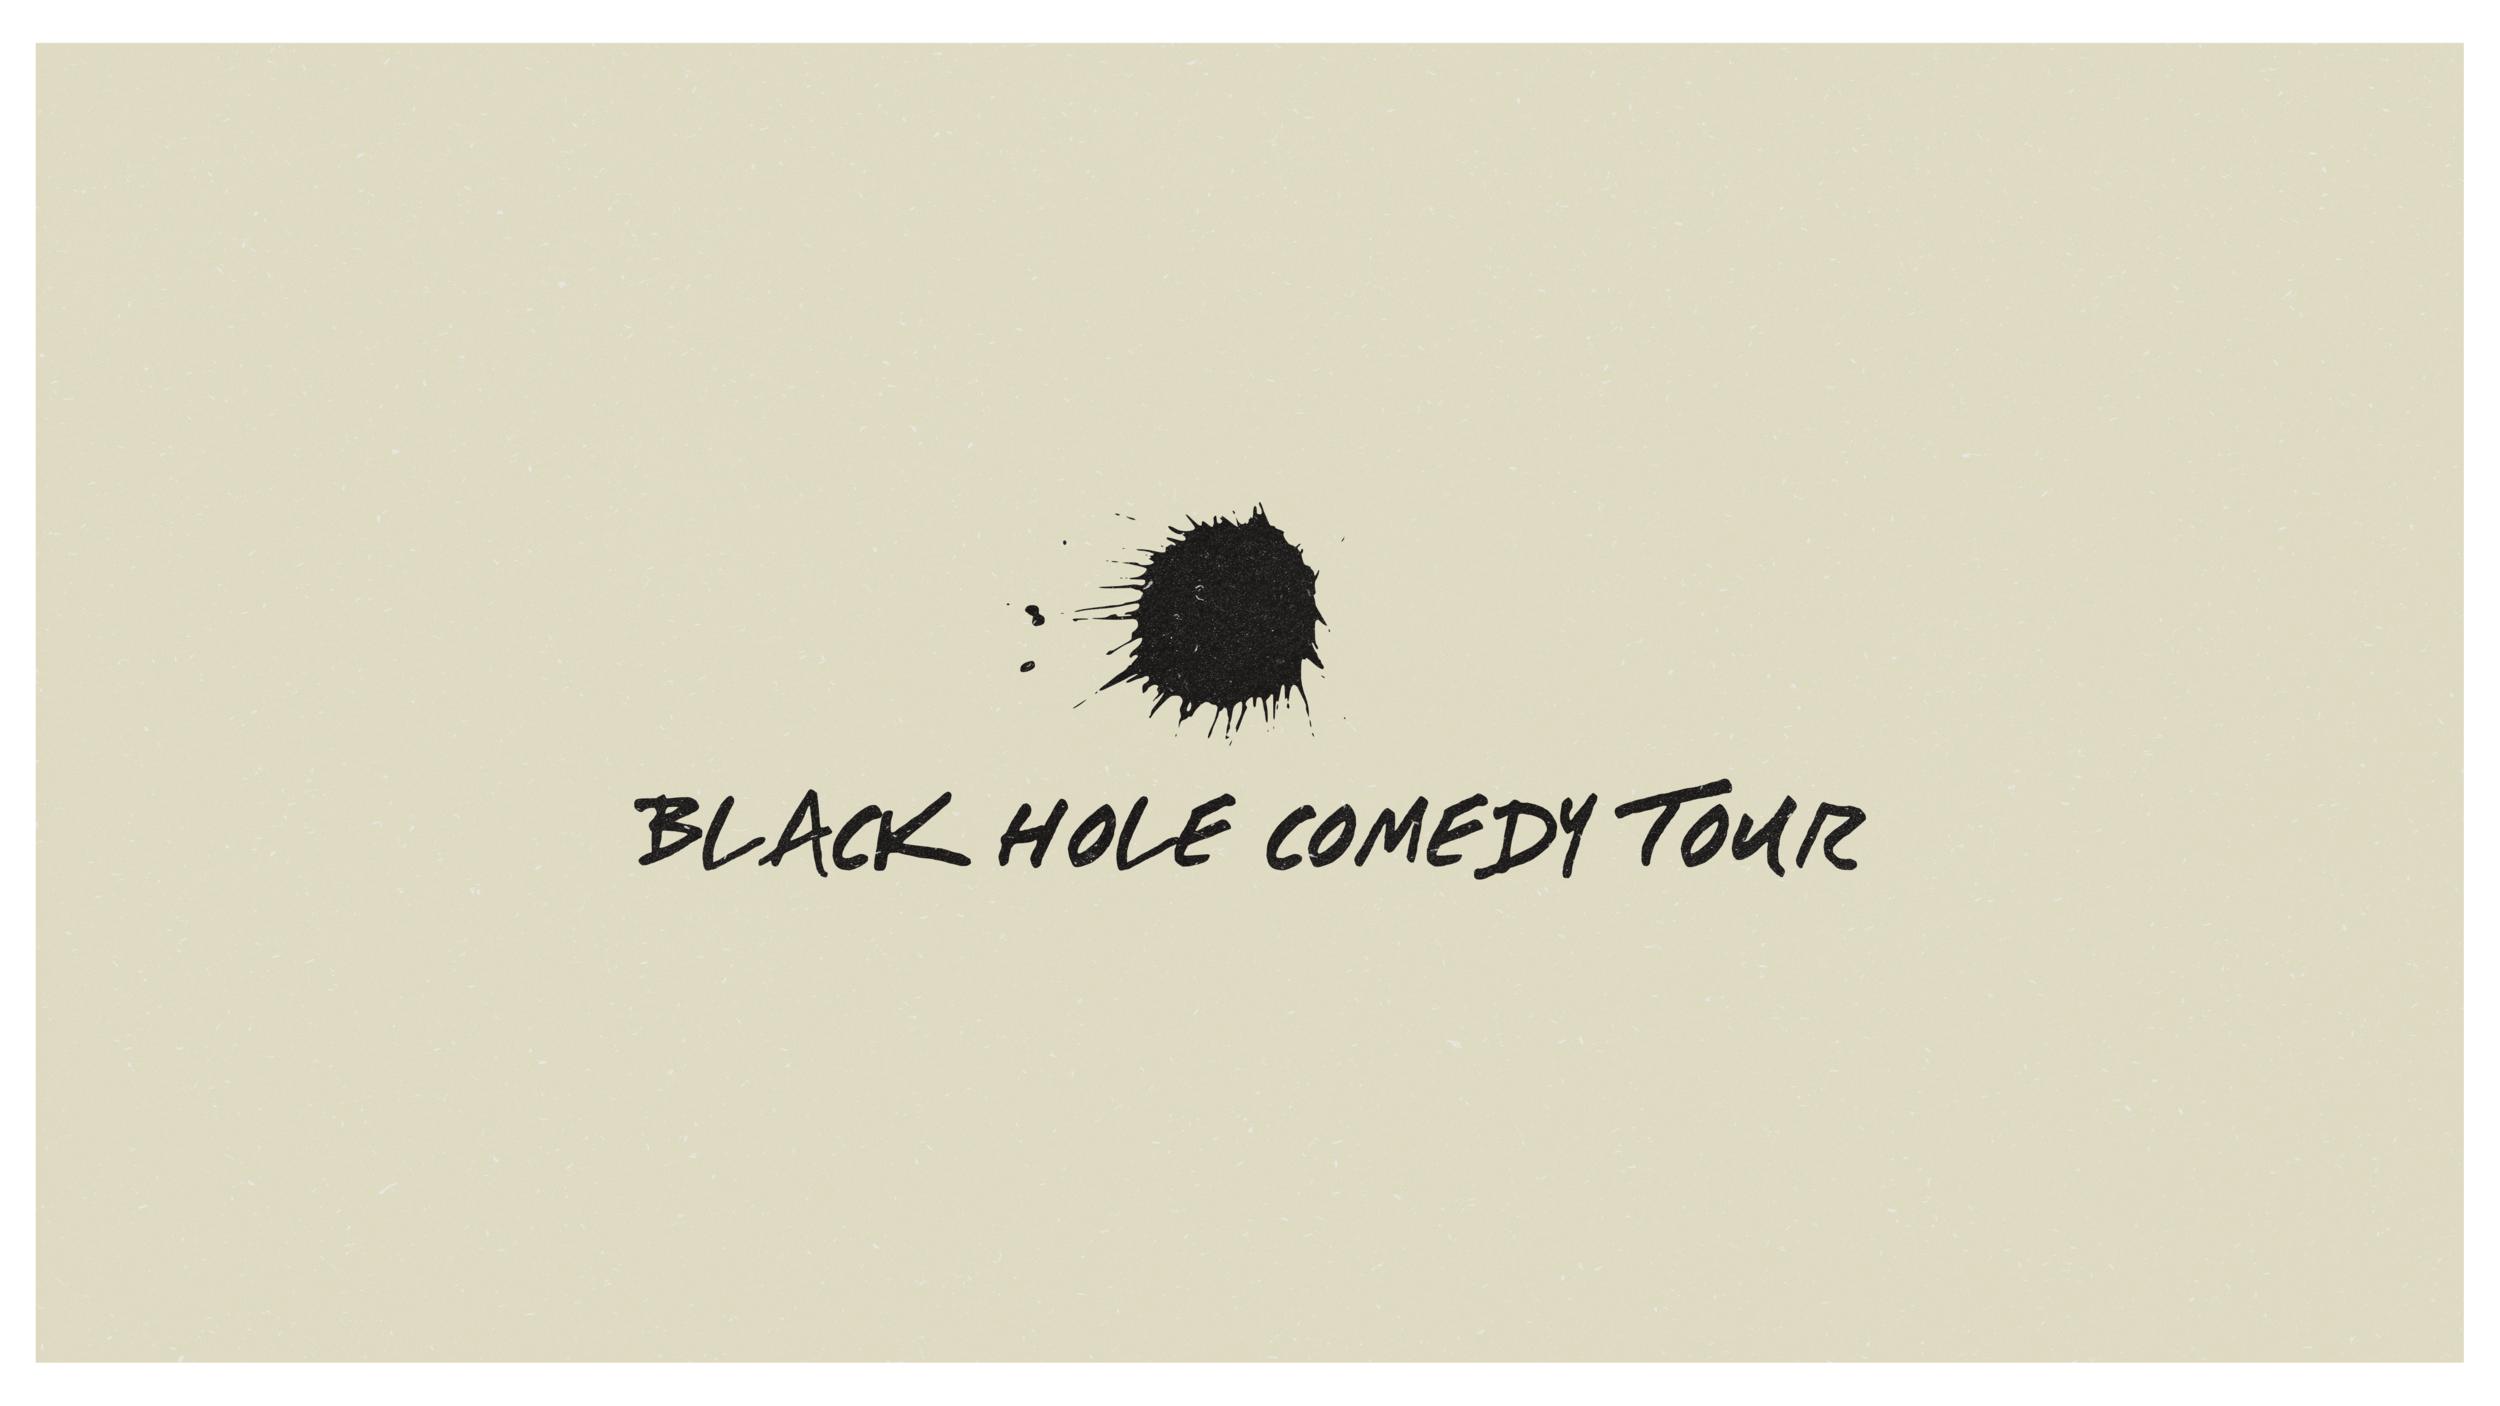 Black Hole Comedy Show Design Idea 3.png